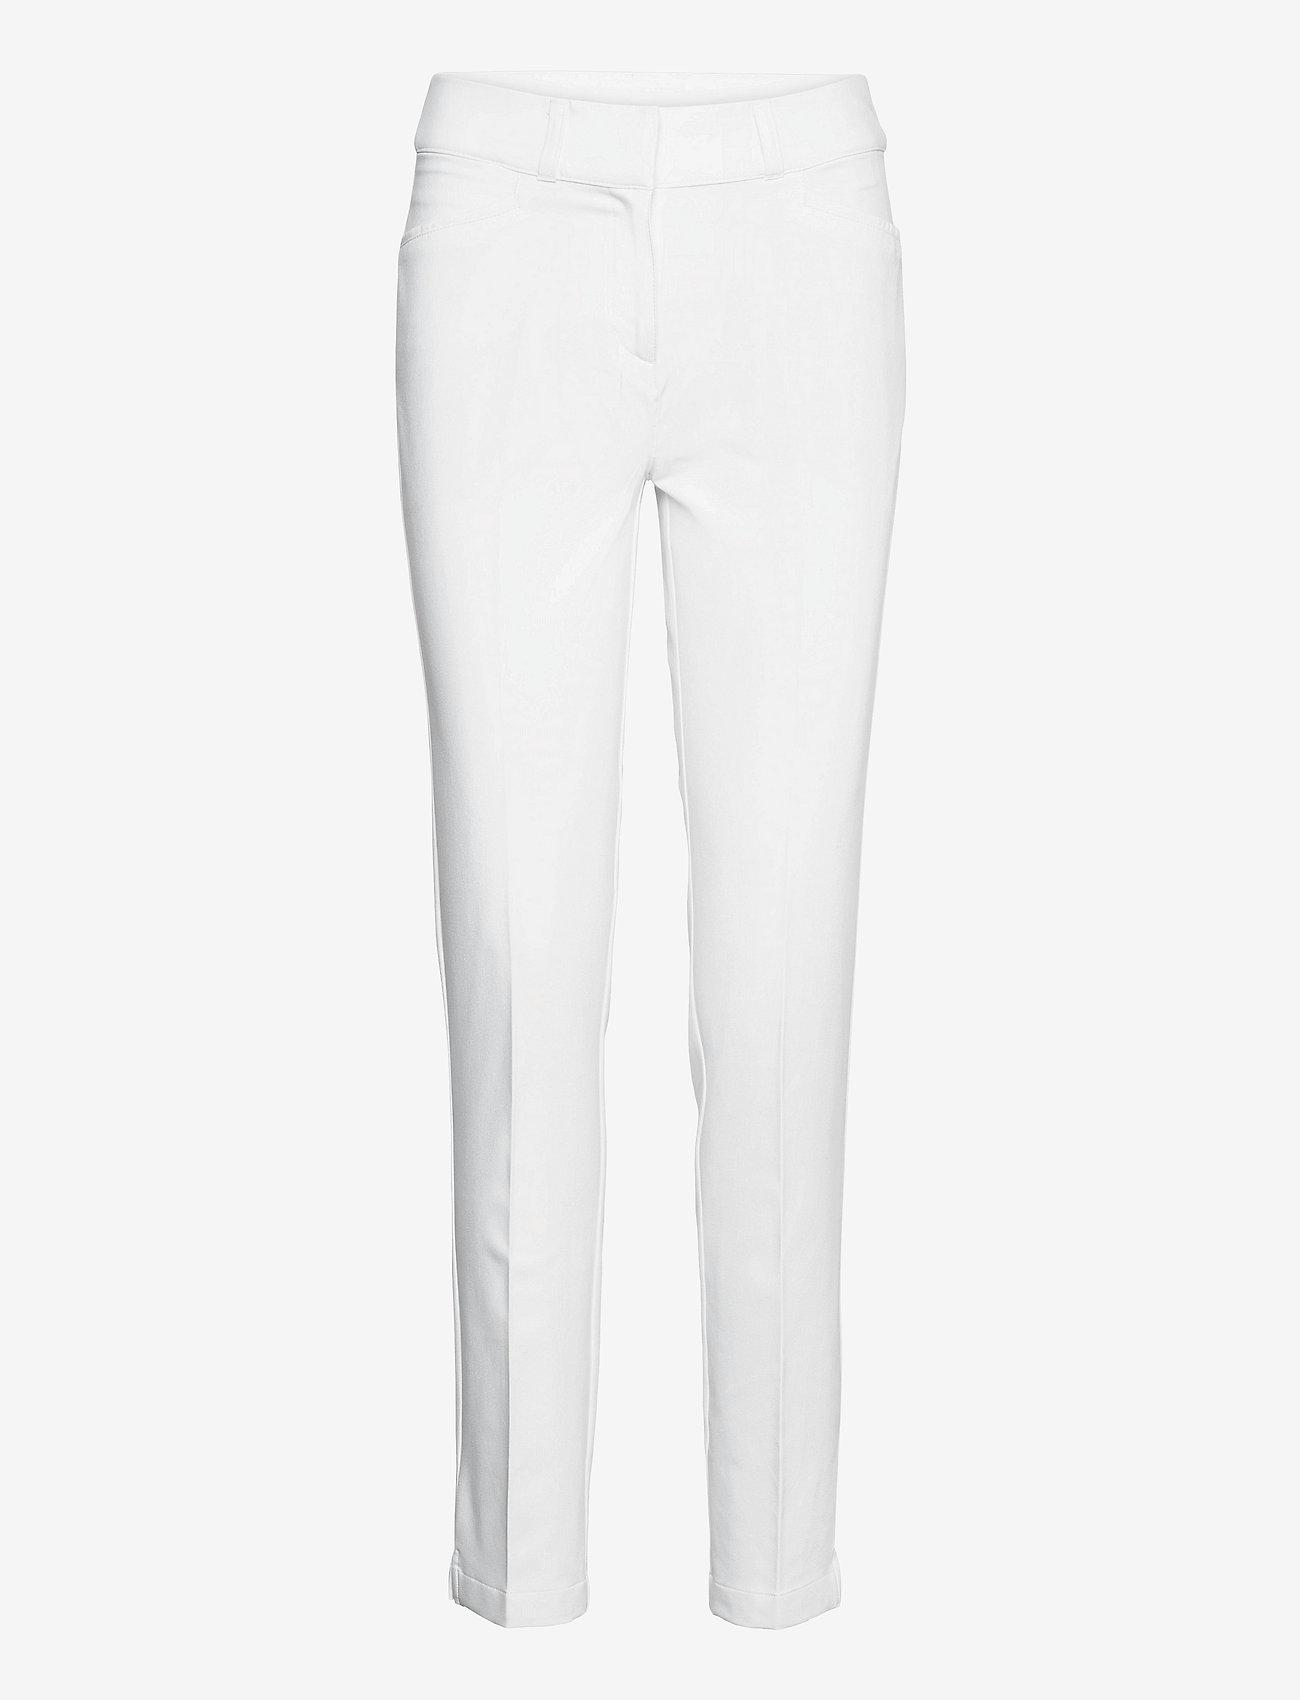 adidas Golf - FL LNGTH PANT - golf pants - white - 1